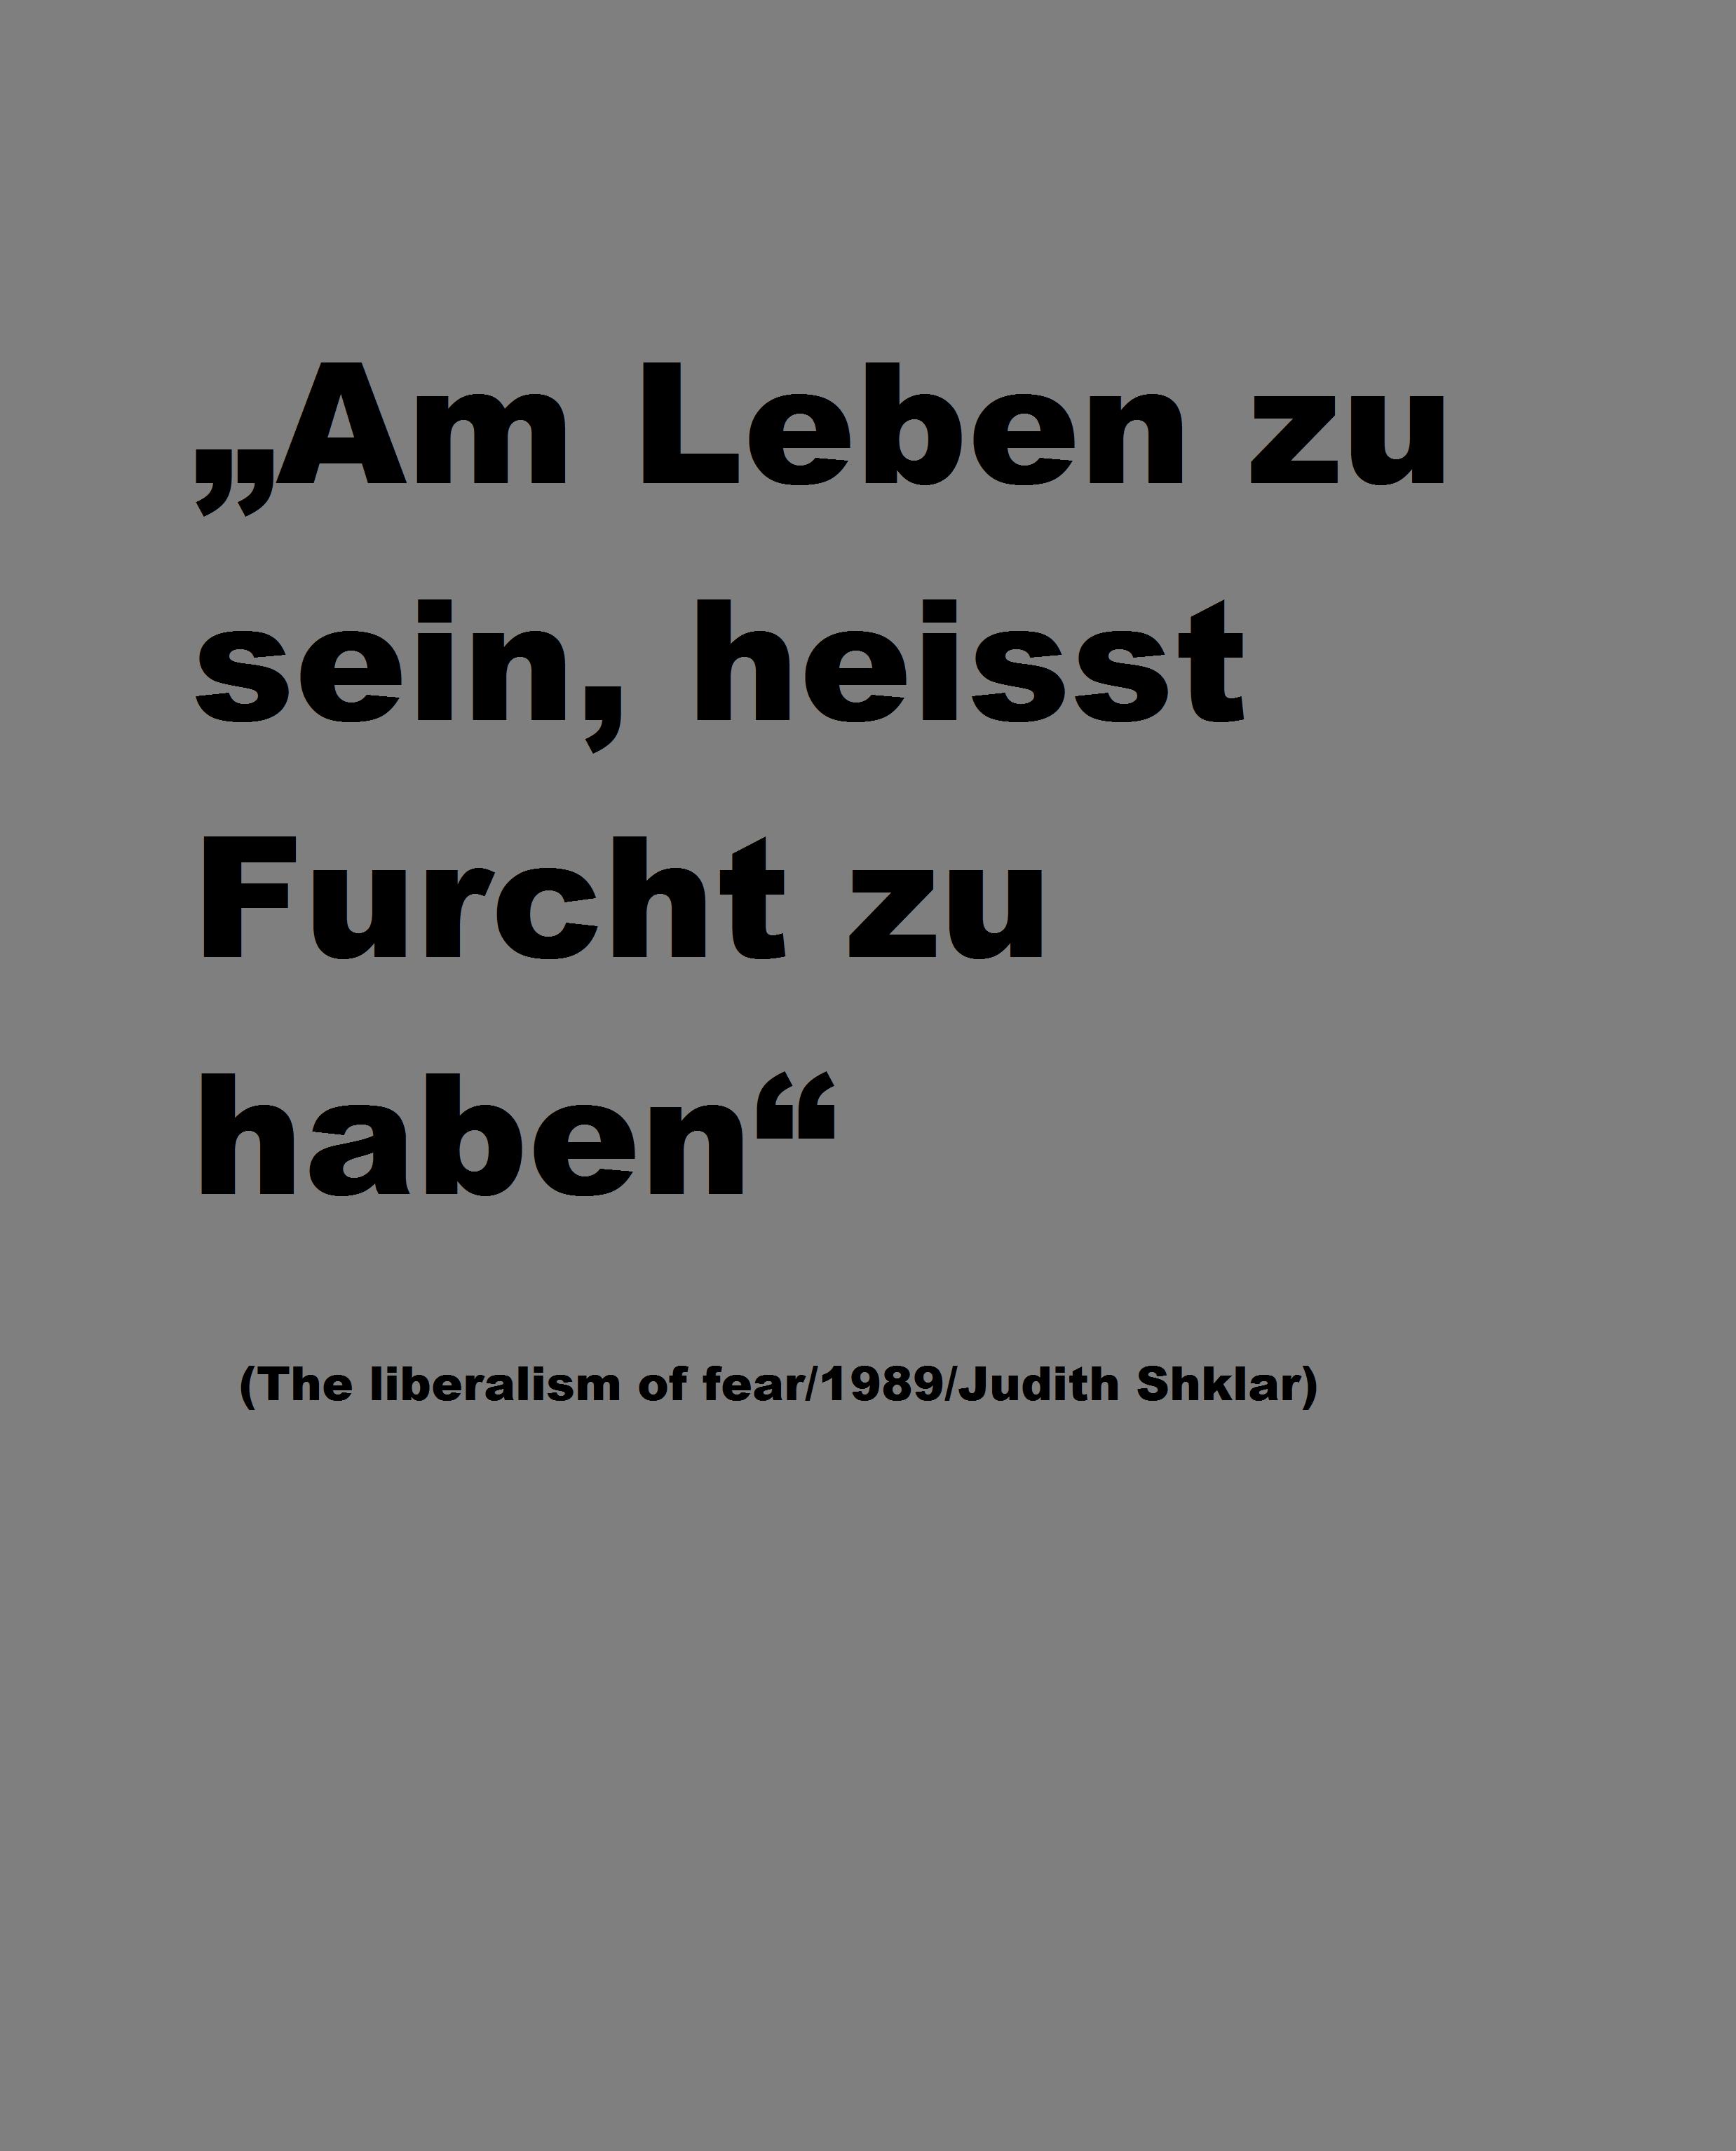 """Am Leben zu sein, heisst Furcht zu haben"" (The liberalism of fear/1989/Judith Shklar)"